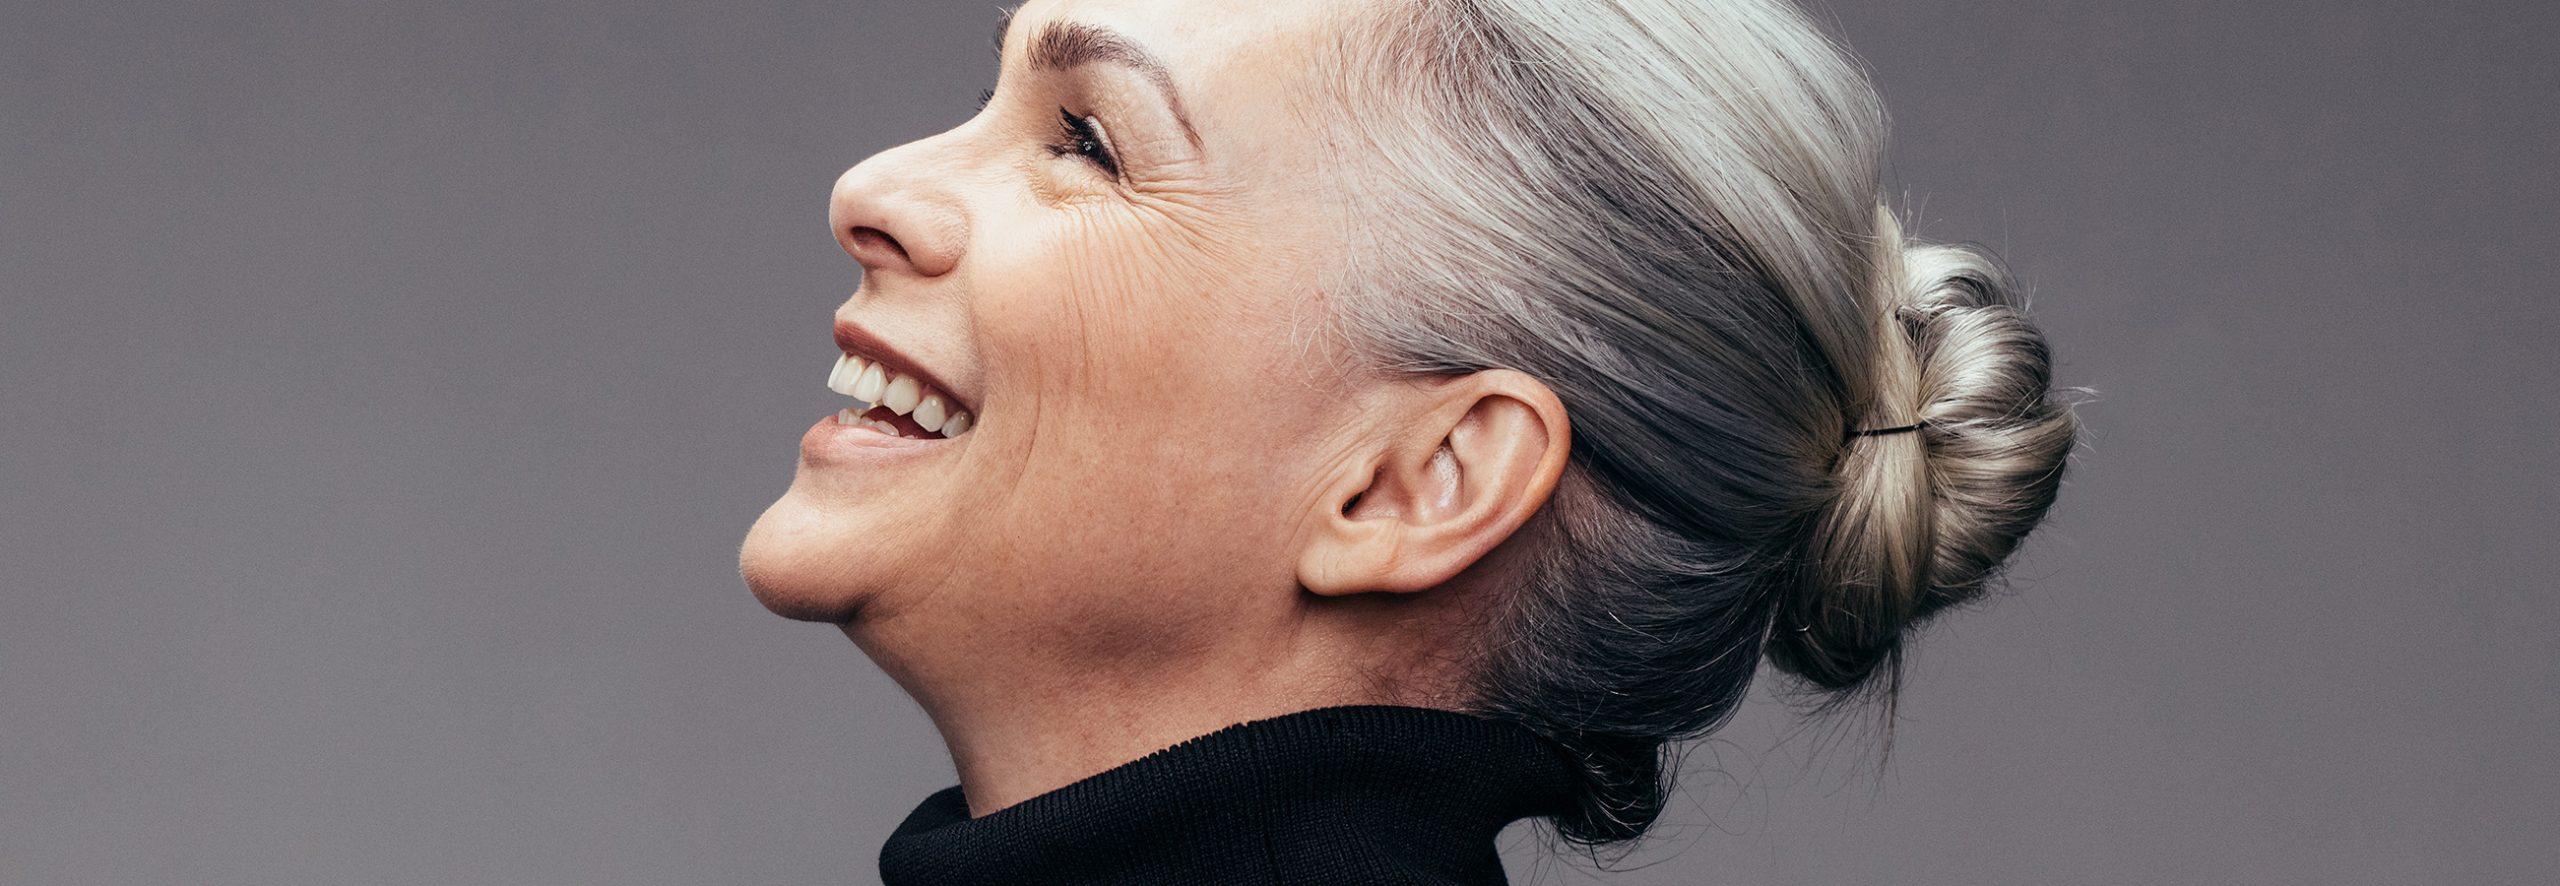 Dank der Parodontosebehandlung beim Zahnarzt in Sauerlach lebt ältere Frau gesünder.